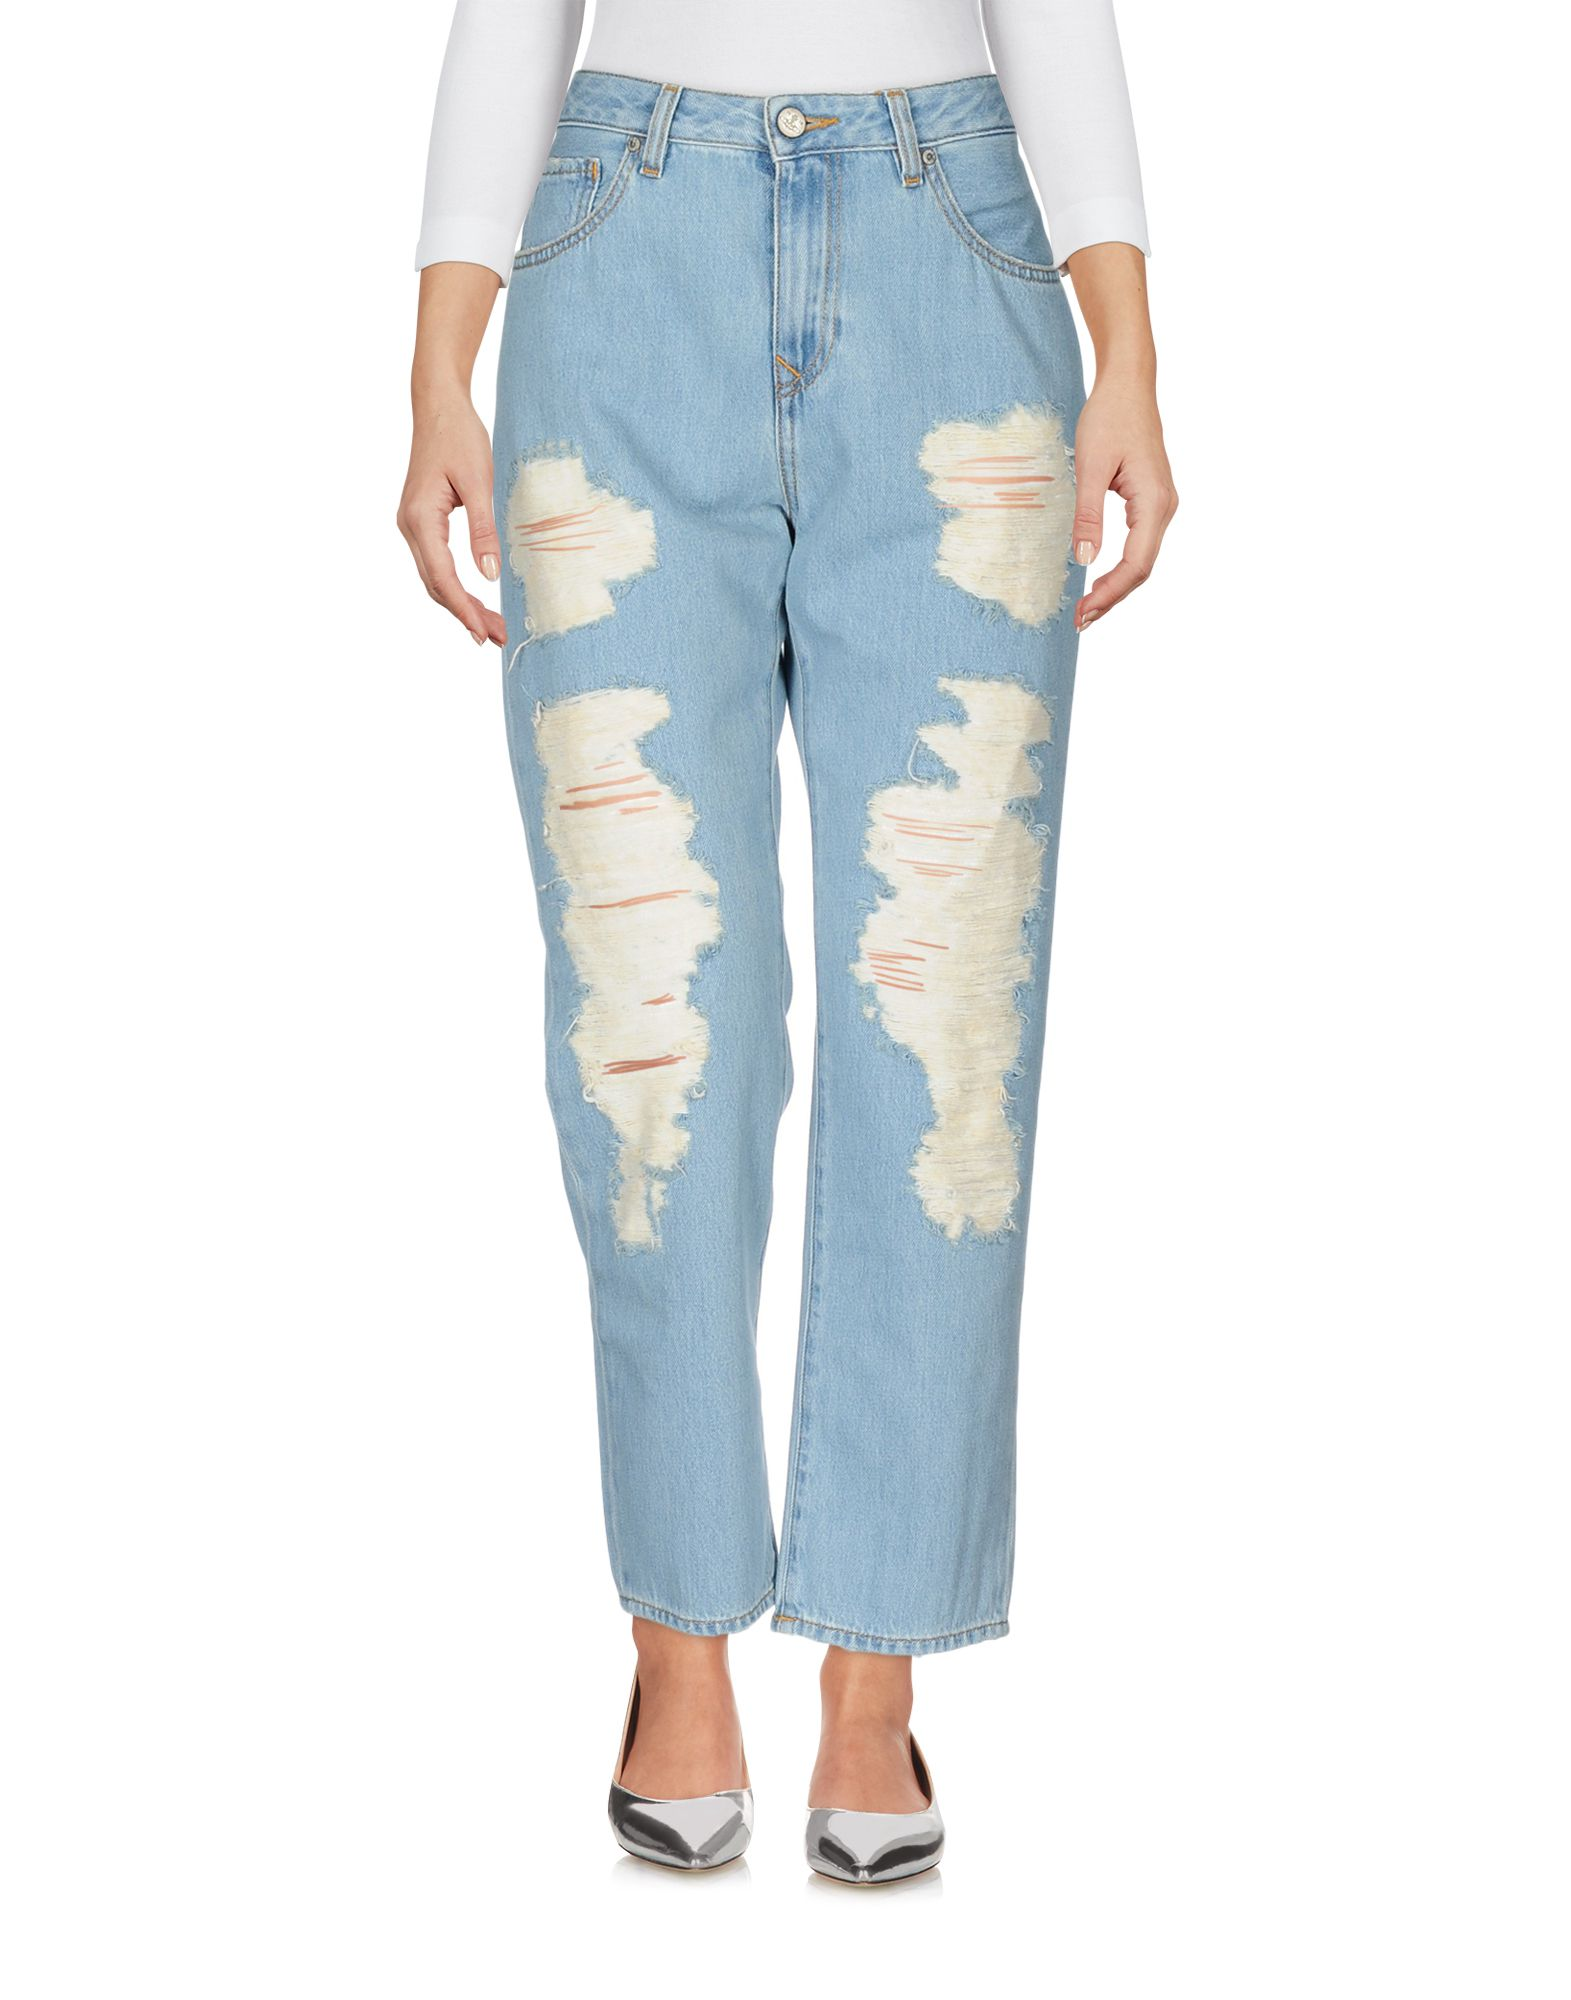 VIVIENNE WESTWOOD ANGLOMANIA Джинсовые брюки рюкзак vivienne westwood vivienne westwood vi873bwvbz09